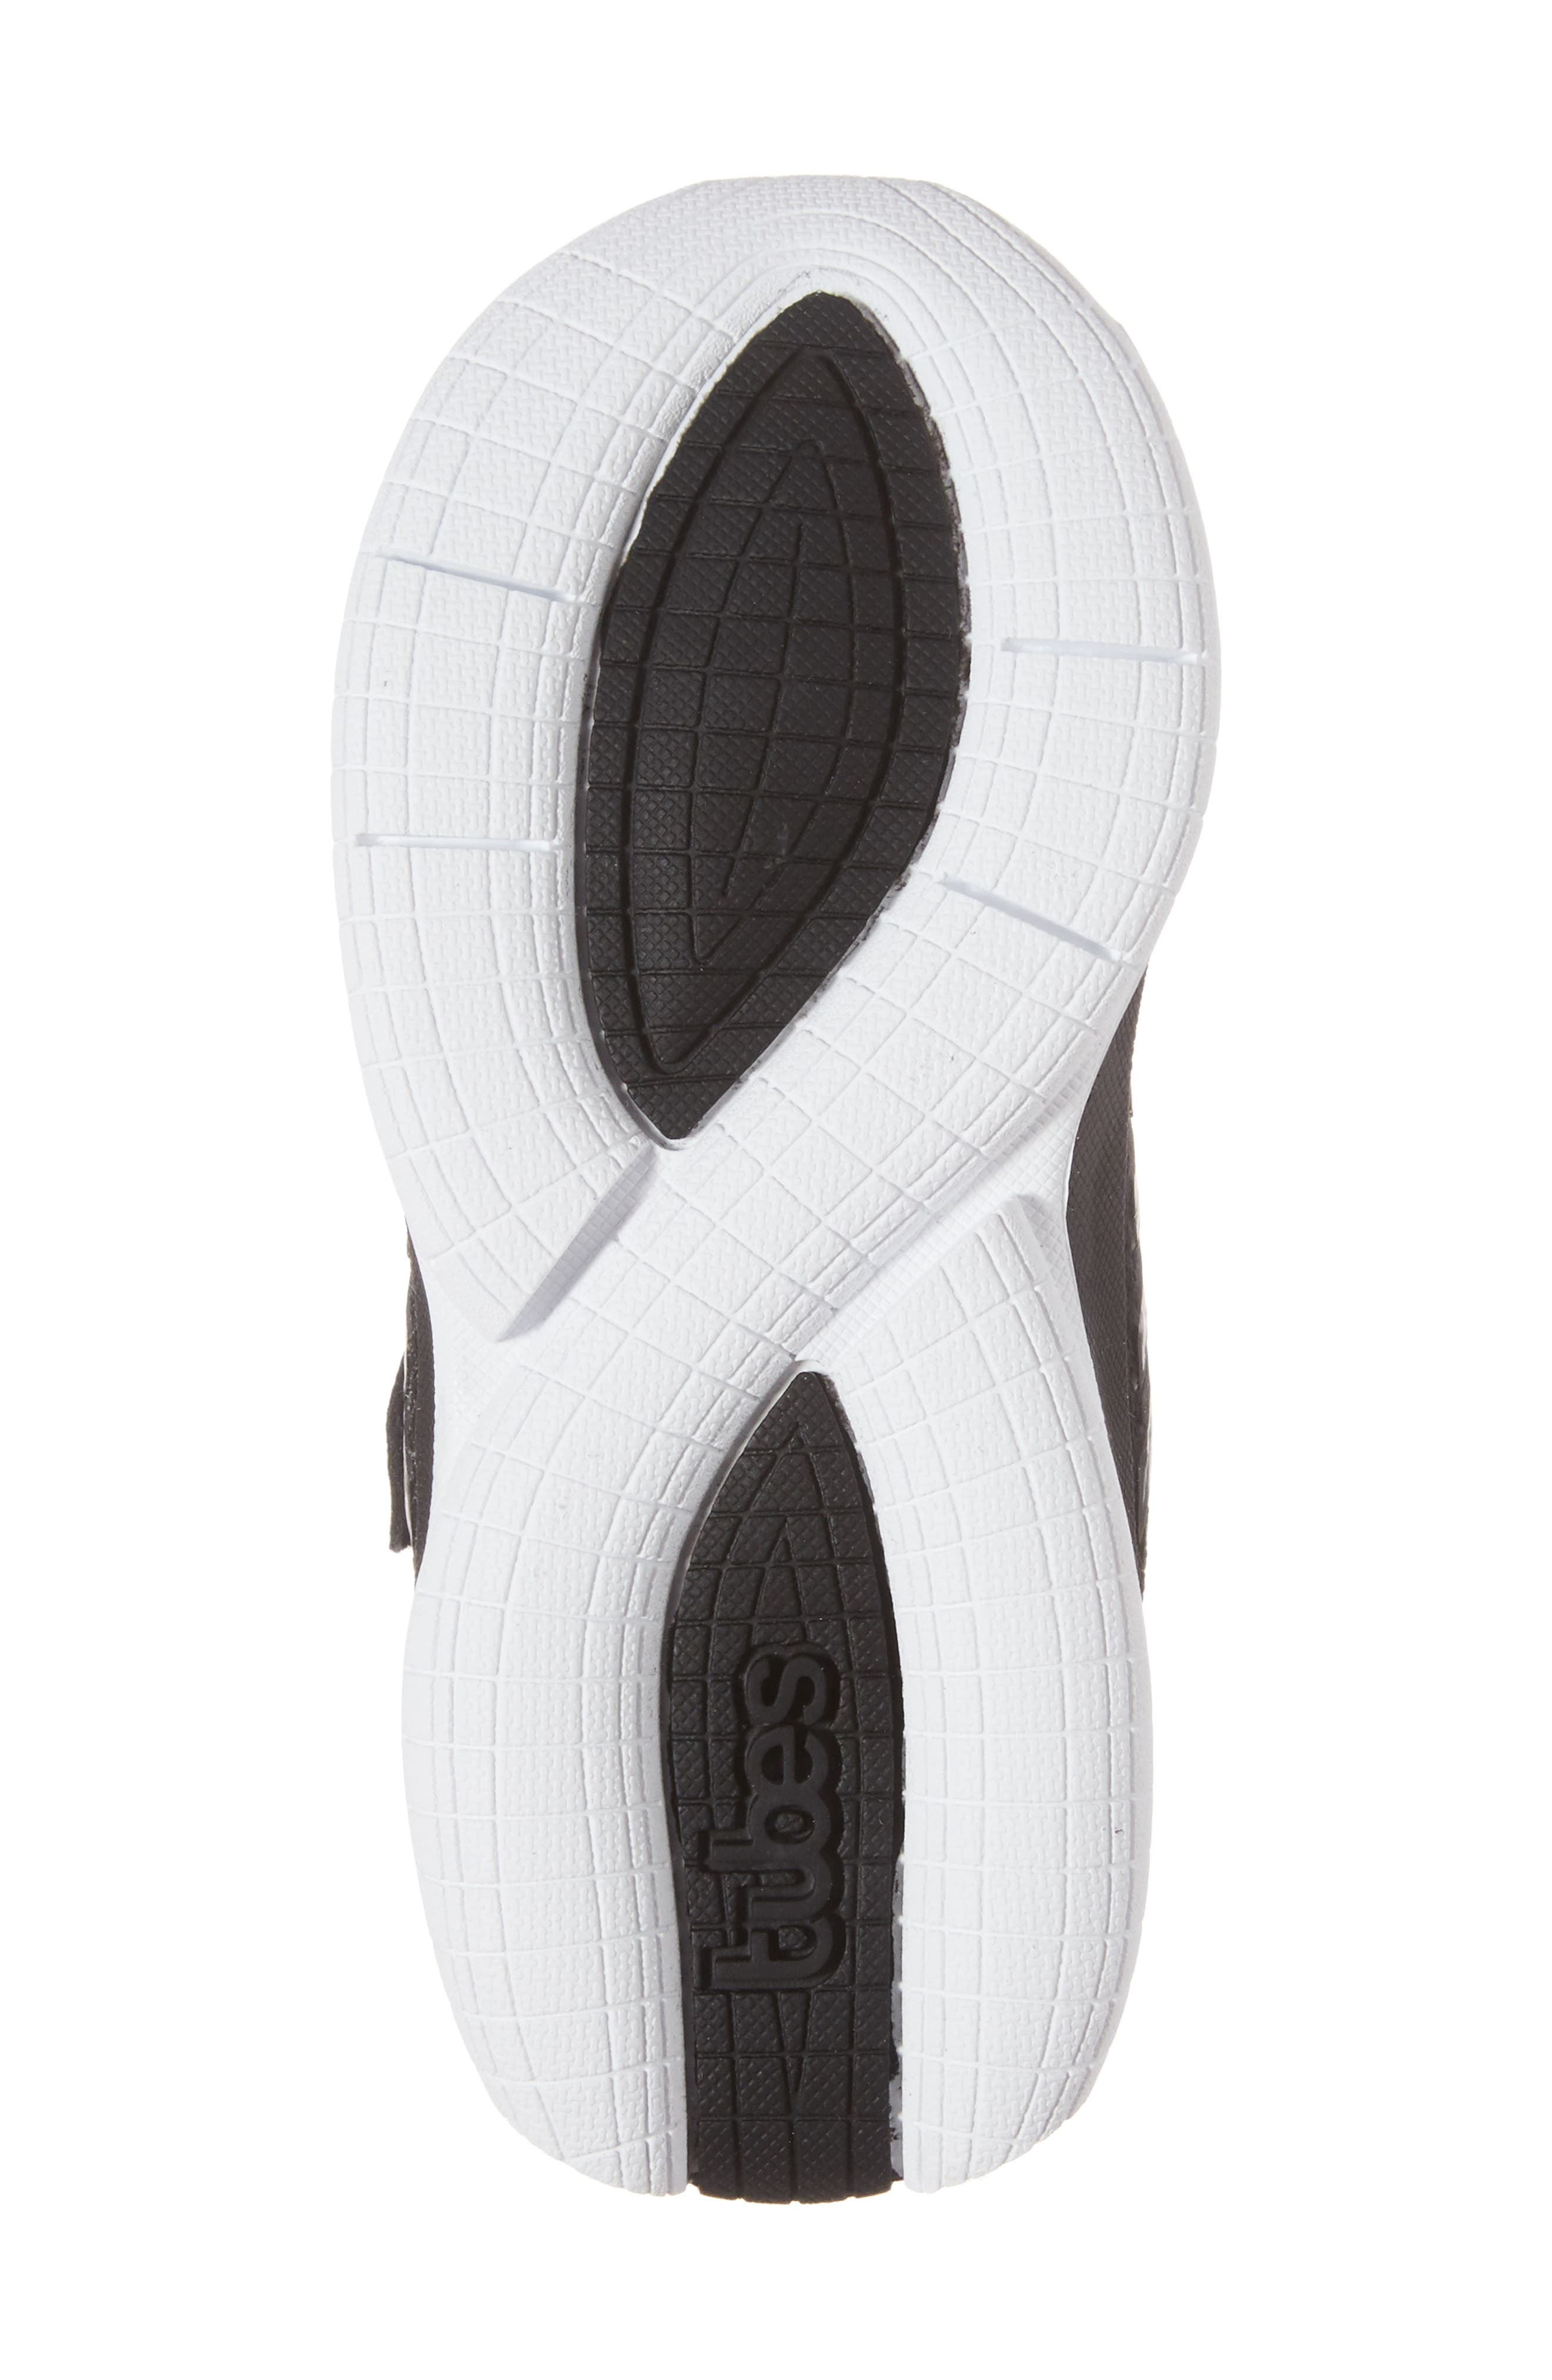 Tubes Infinity Sneaker,                             Alternate thumbnail 6, color,                             002